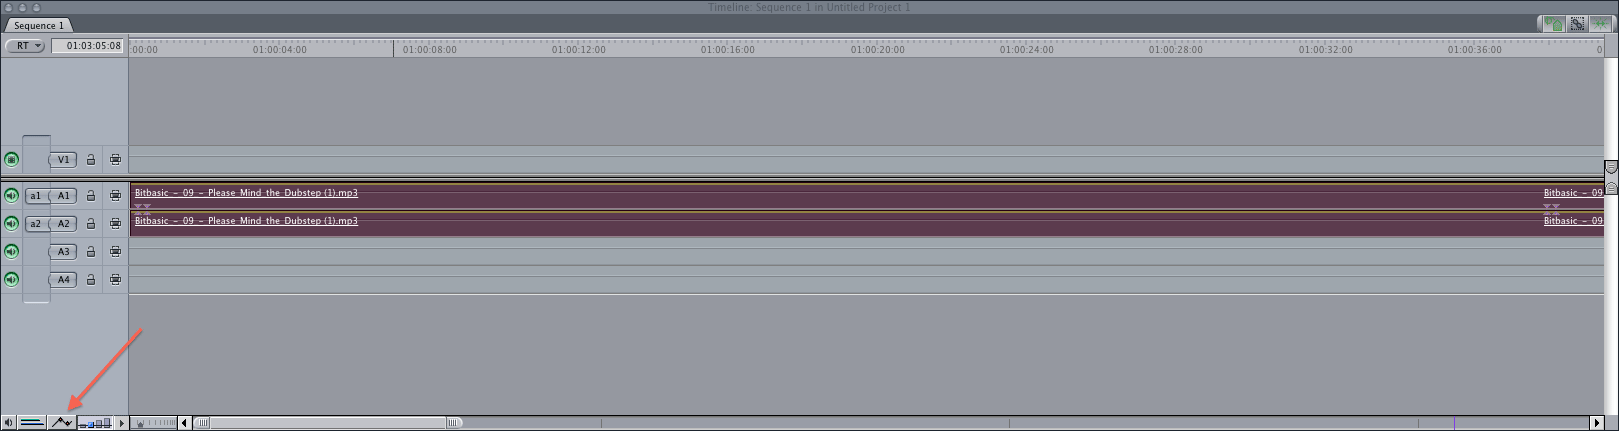 Adding & editing music - Vimeo Blog